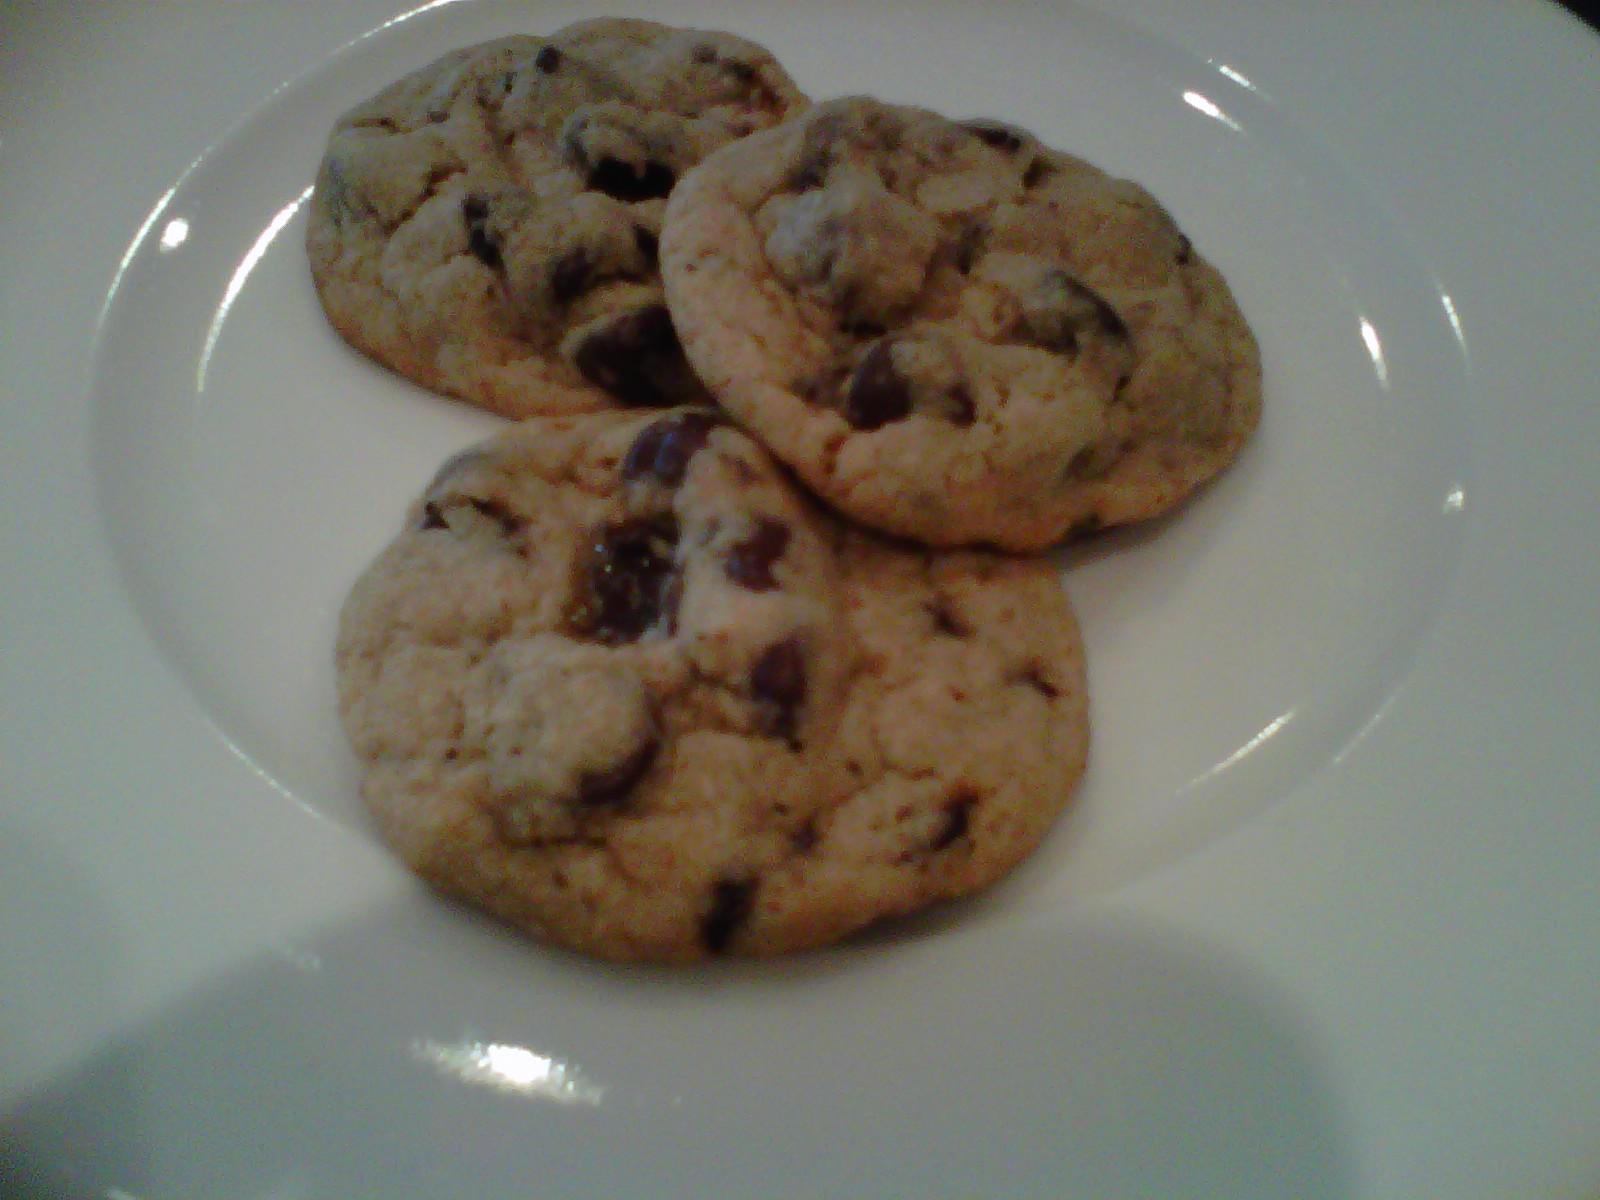 The Urban Legend: Neiman Marcus $250 Chocolate Chip Cookie Recipe ...